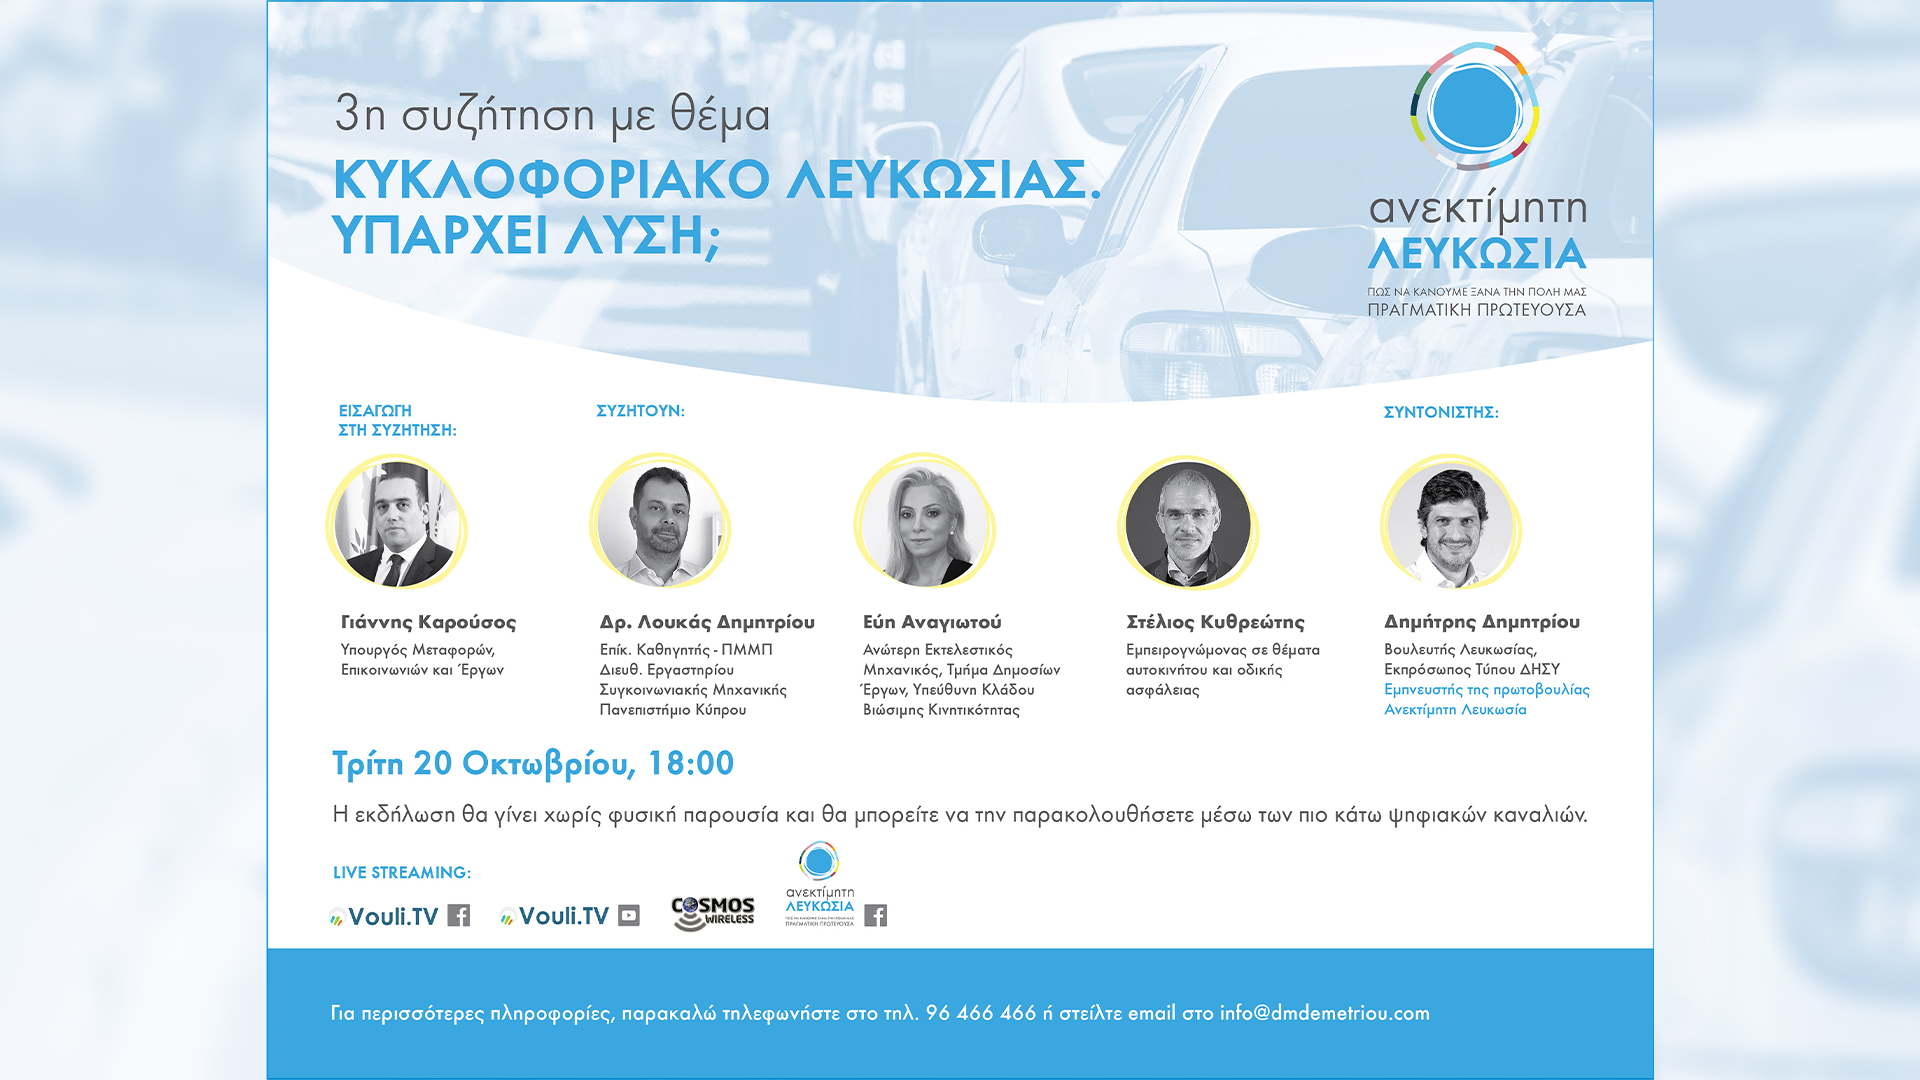 LIVE   Κυκλοφοριακό Λευκωσίας: Υπάρχει λύση;   Τρίτη 20 Οκτωβρίου 2020